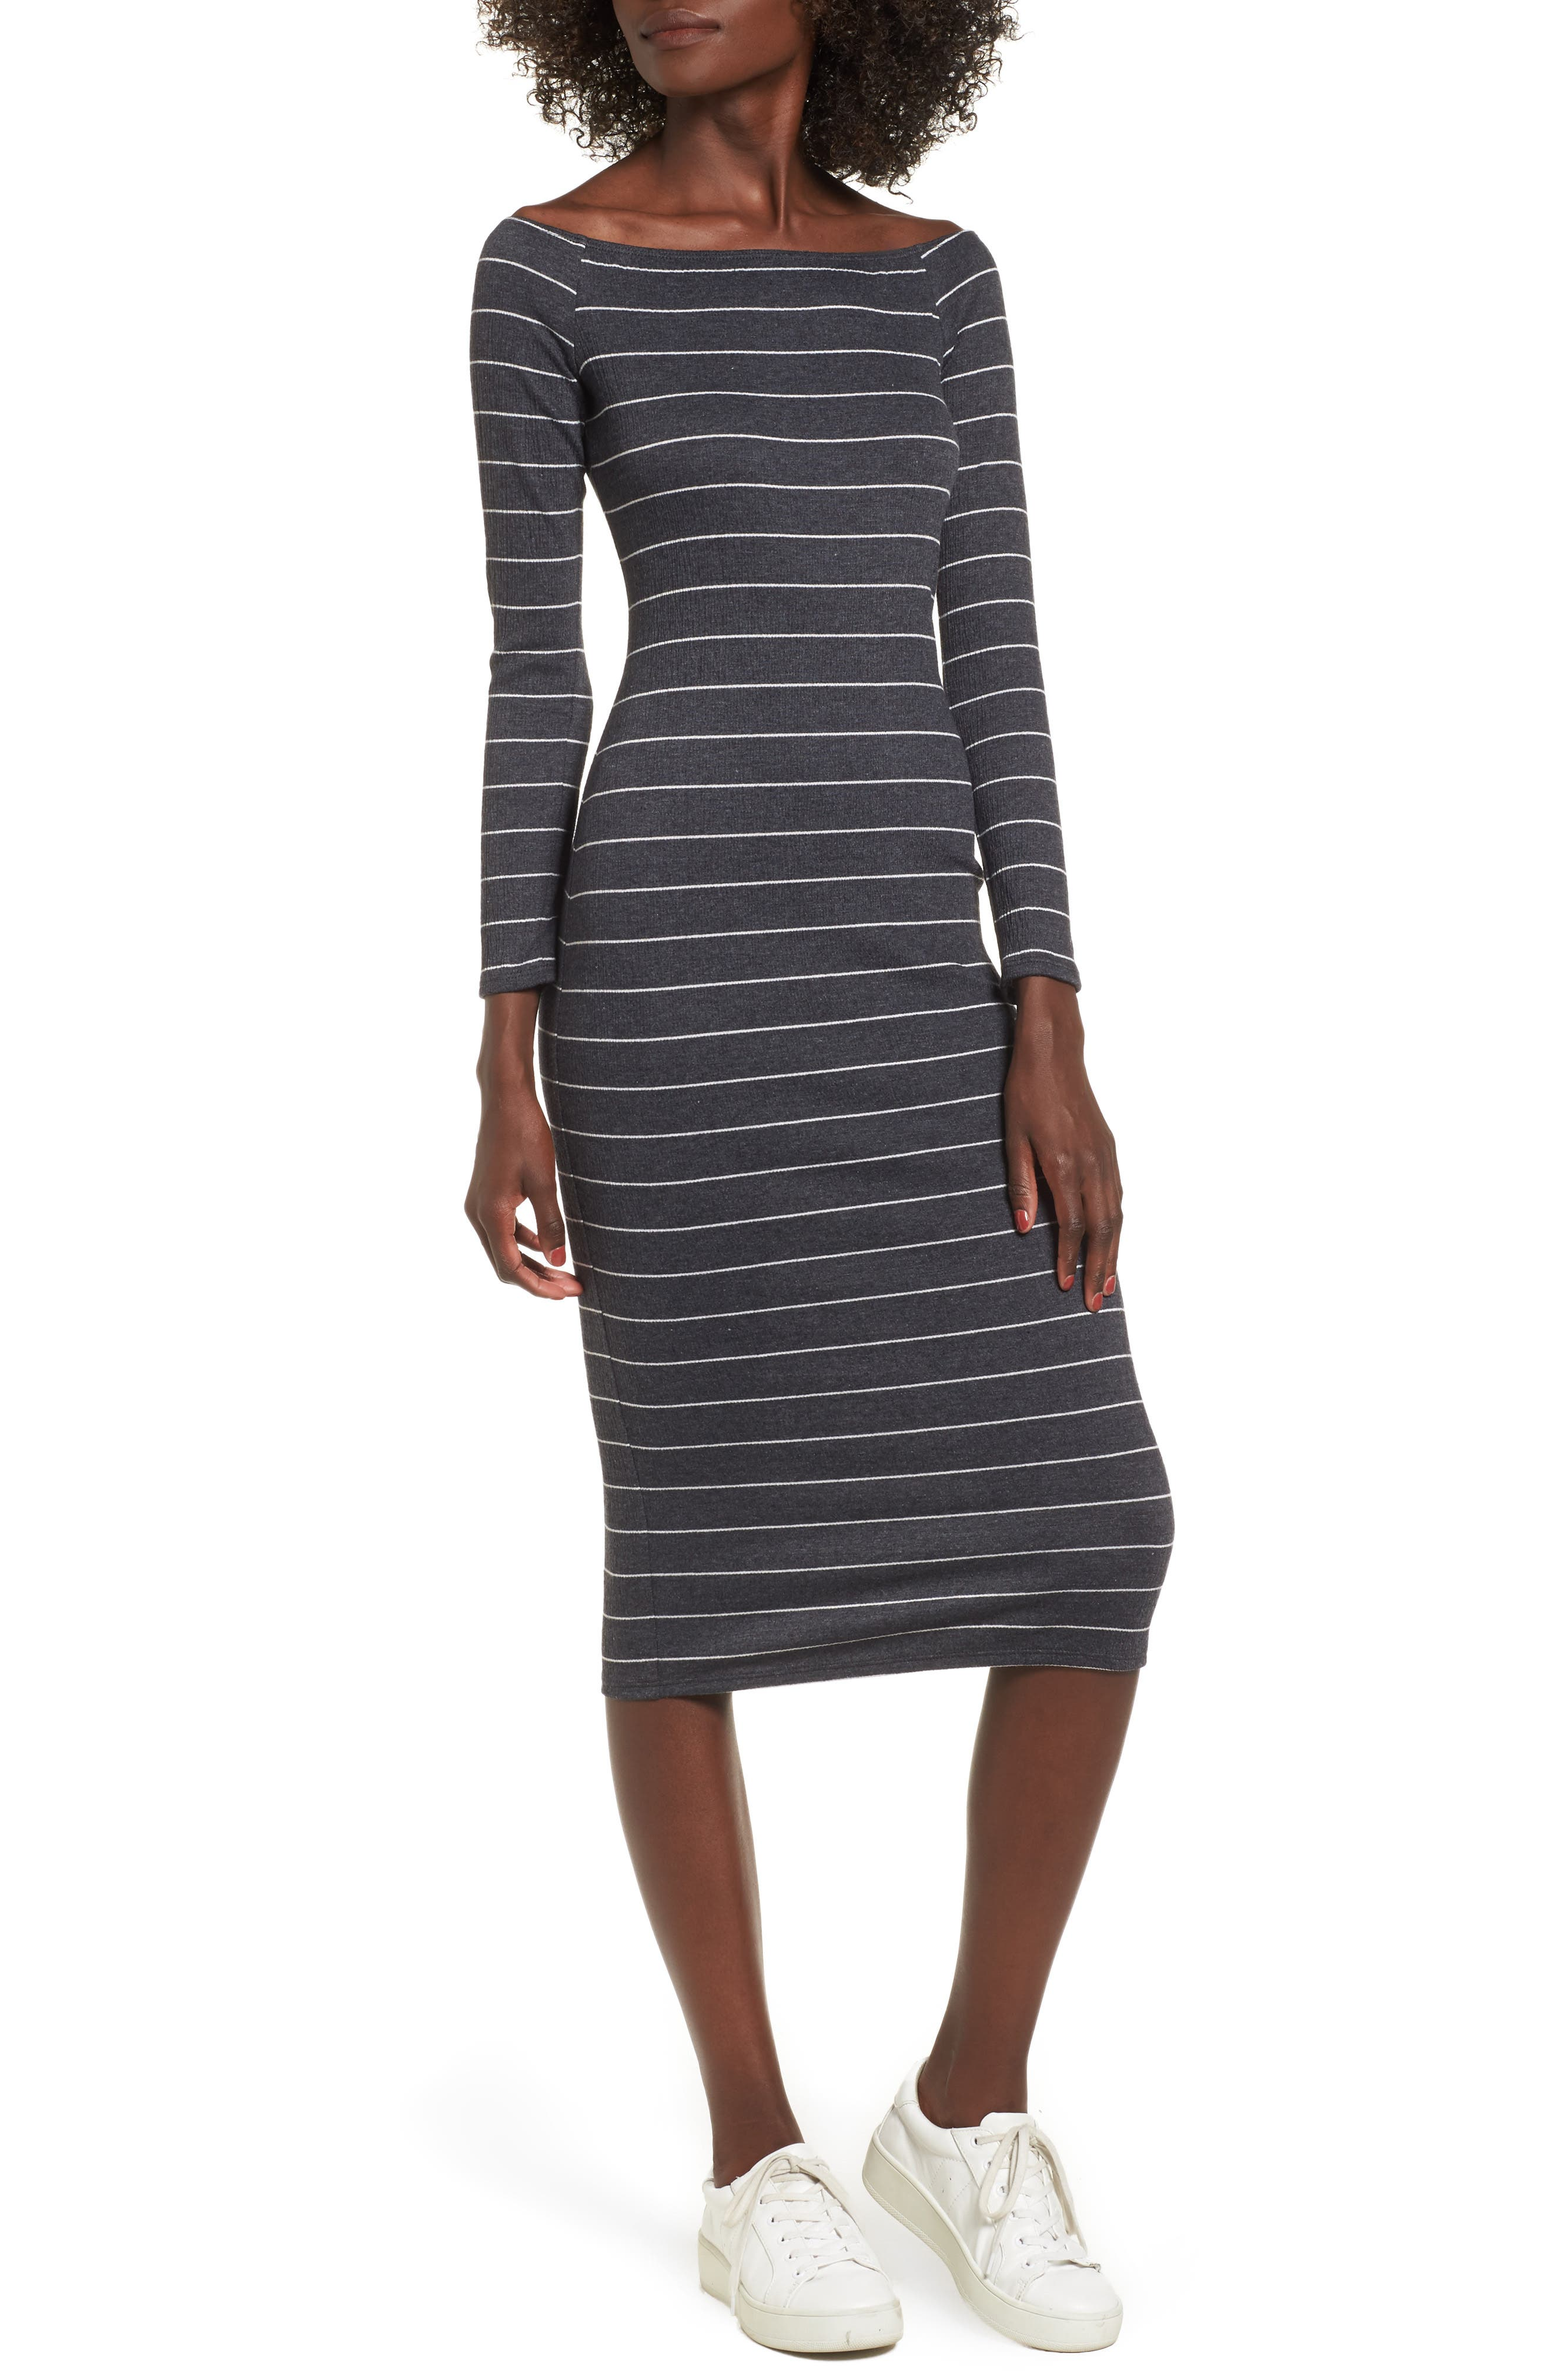 Stripe Off the Shoulder Midi Dress,                             Main thumbnail 1, color,                             020